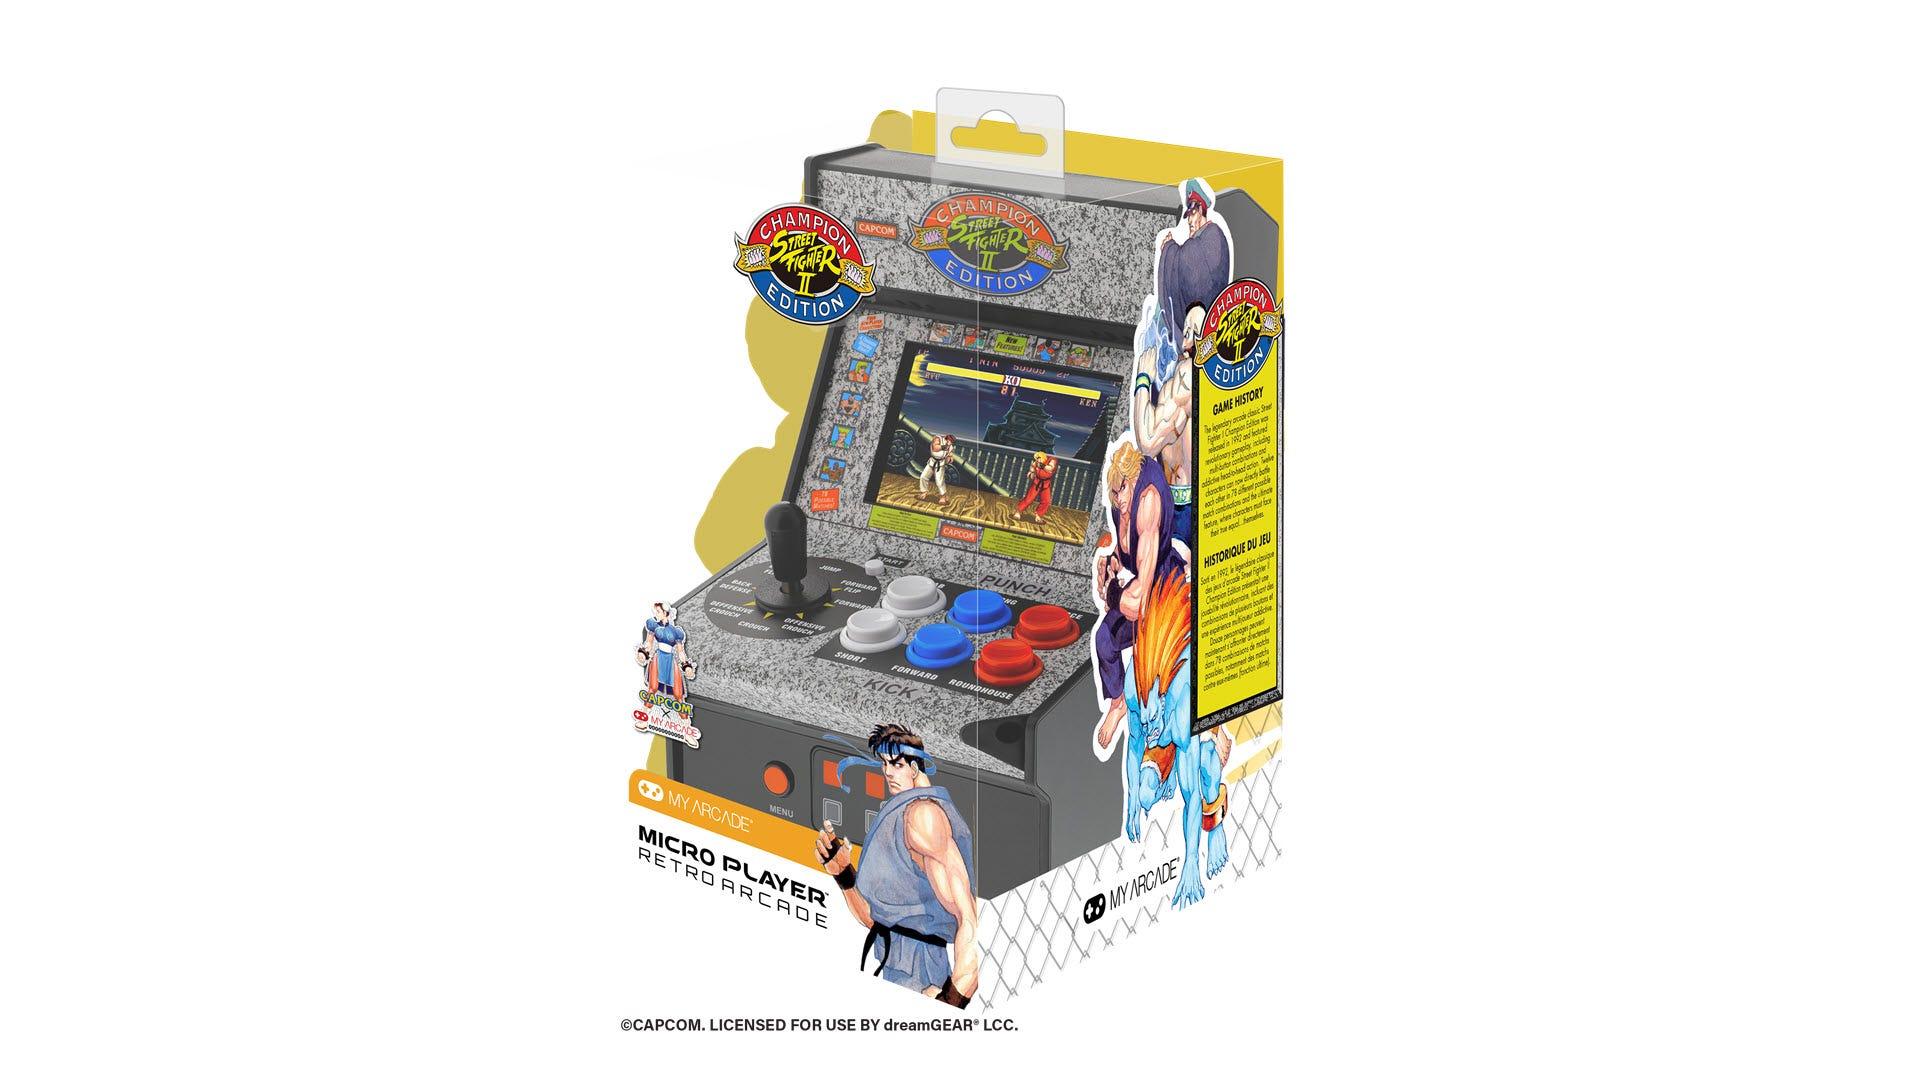 The 'Street Fighter II' Micro Arcade in packaging.